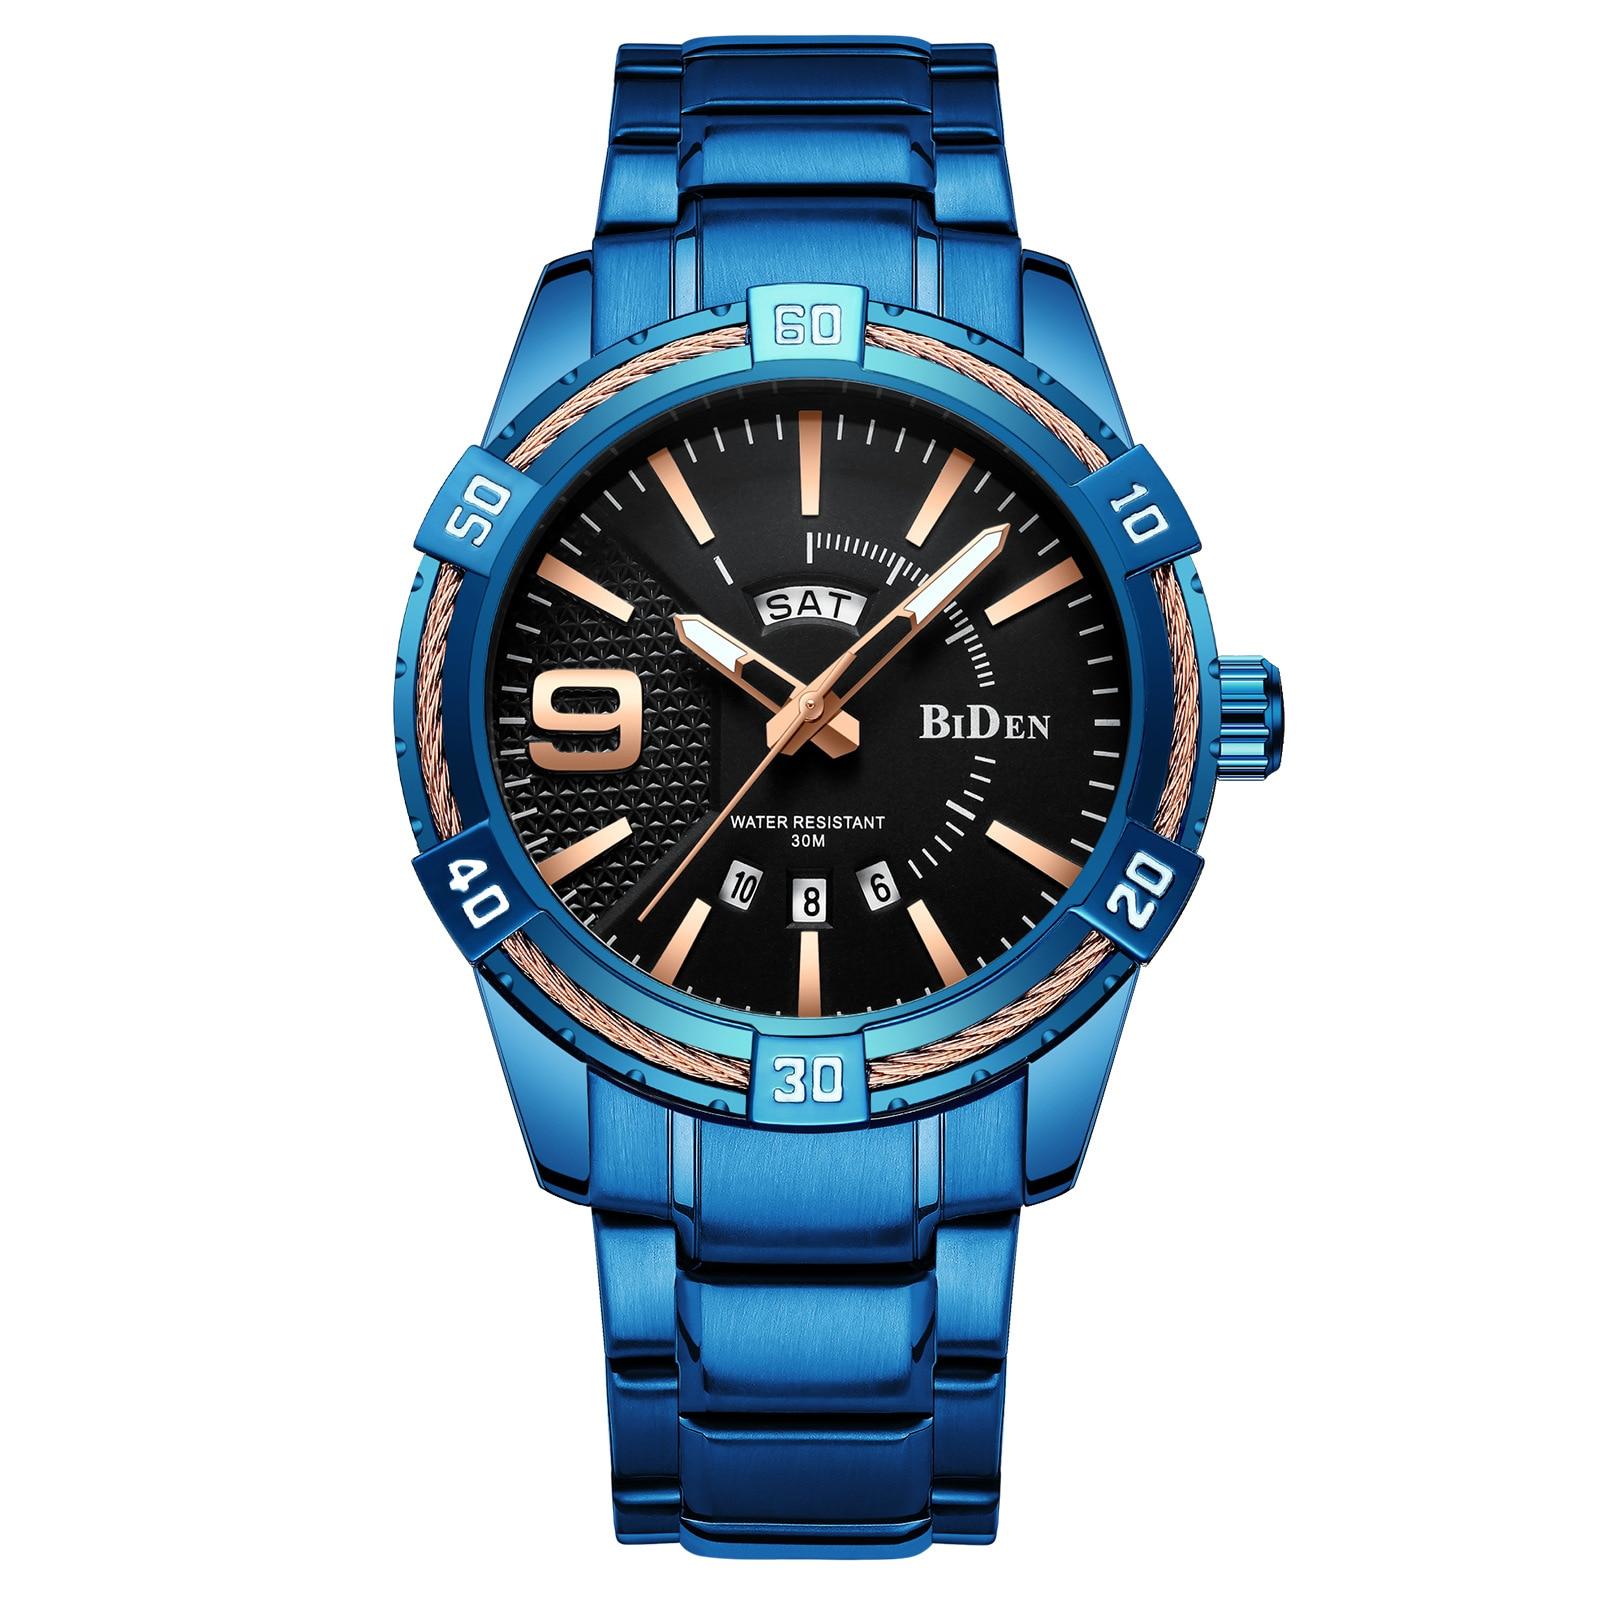 mens blue watches BIDEN brand waterproof fashion man wristwatches quartz stainless steel male clocks calendar Japan movement